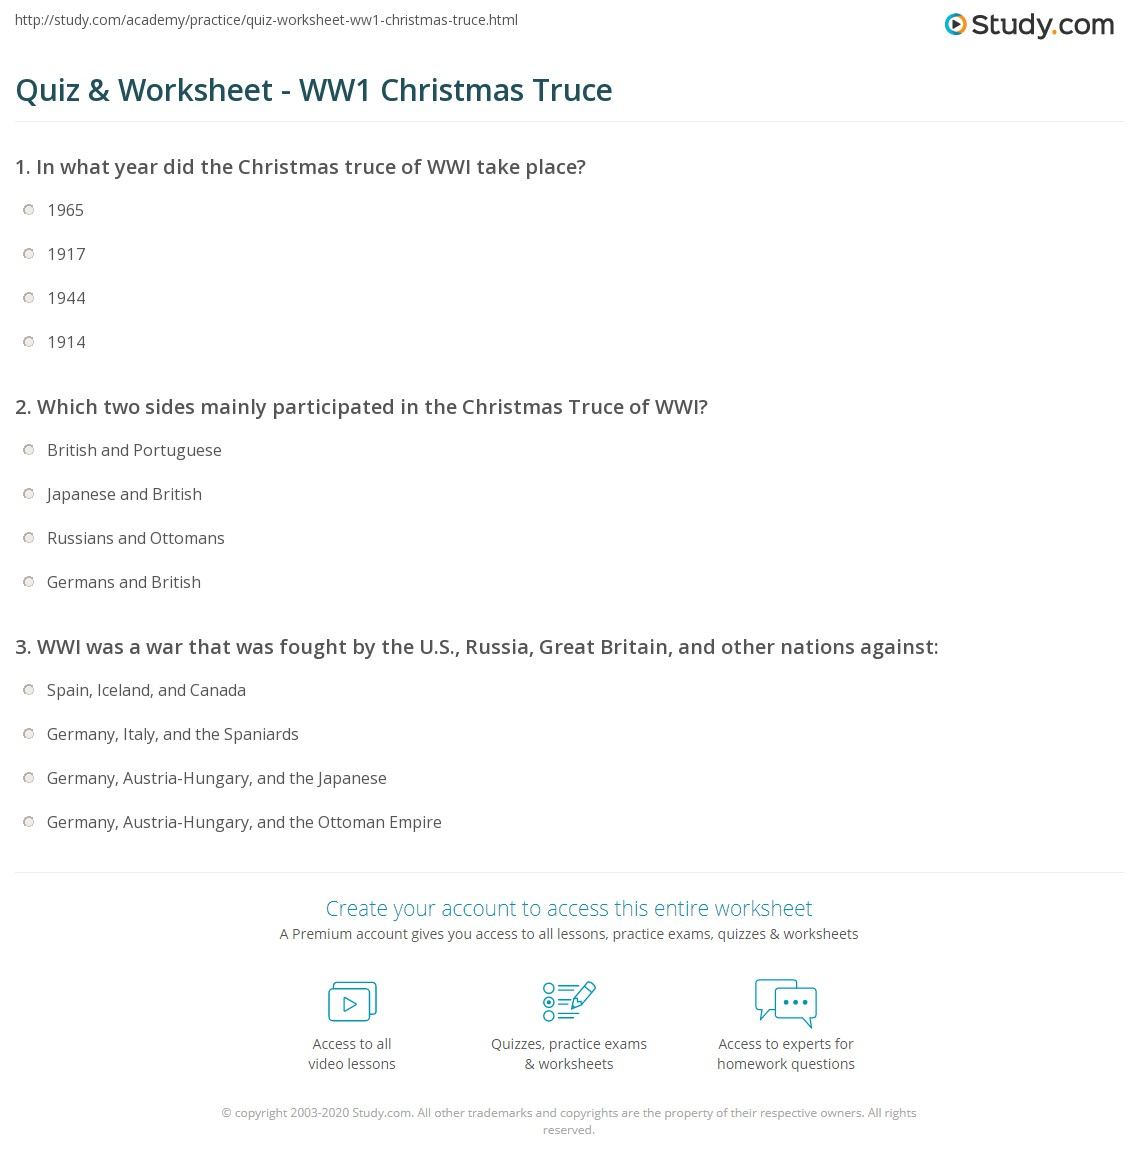 Quiz & Worksheet - Ww1 Christmas Truce | Study